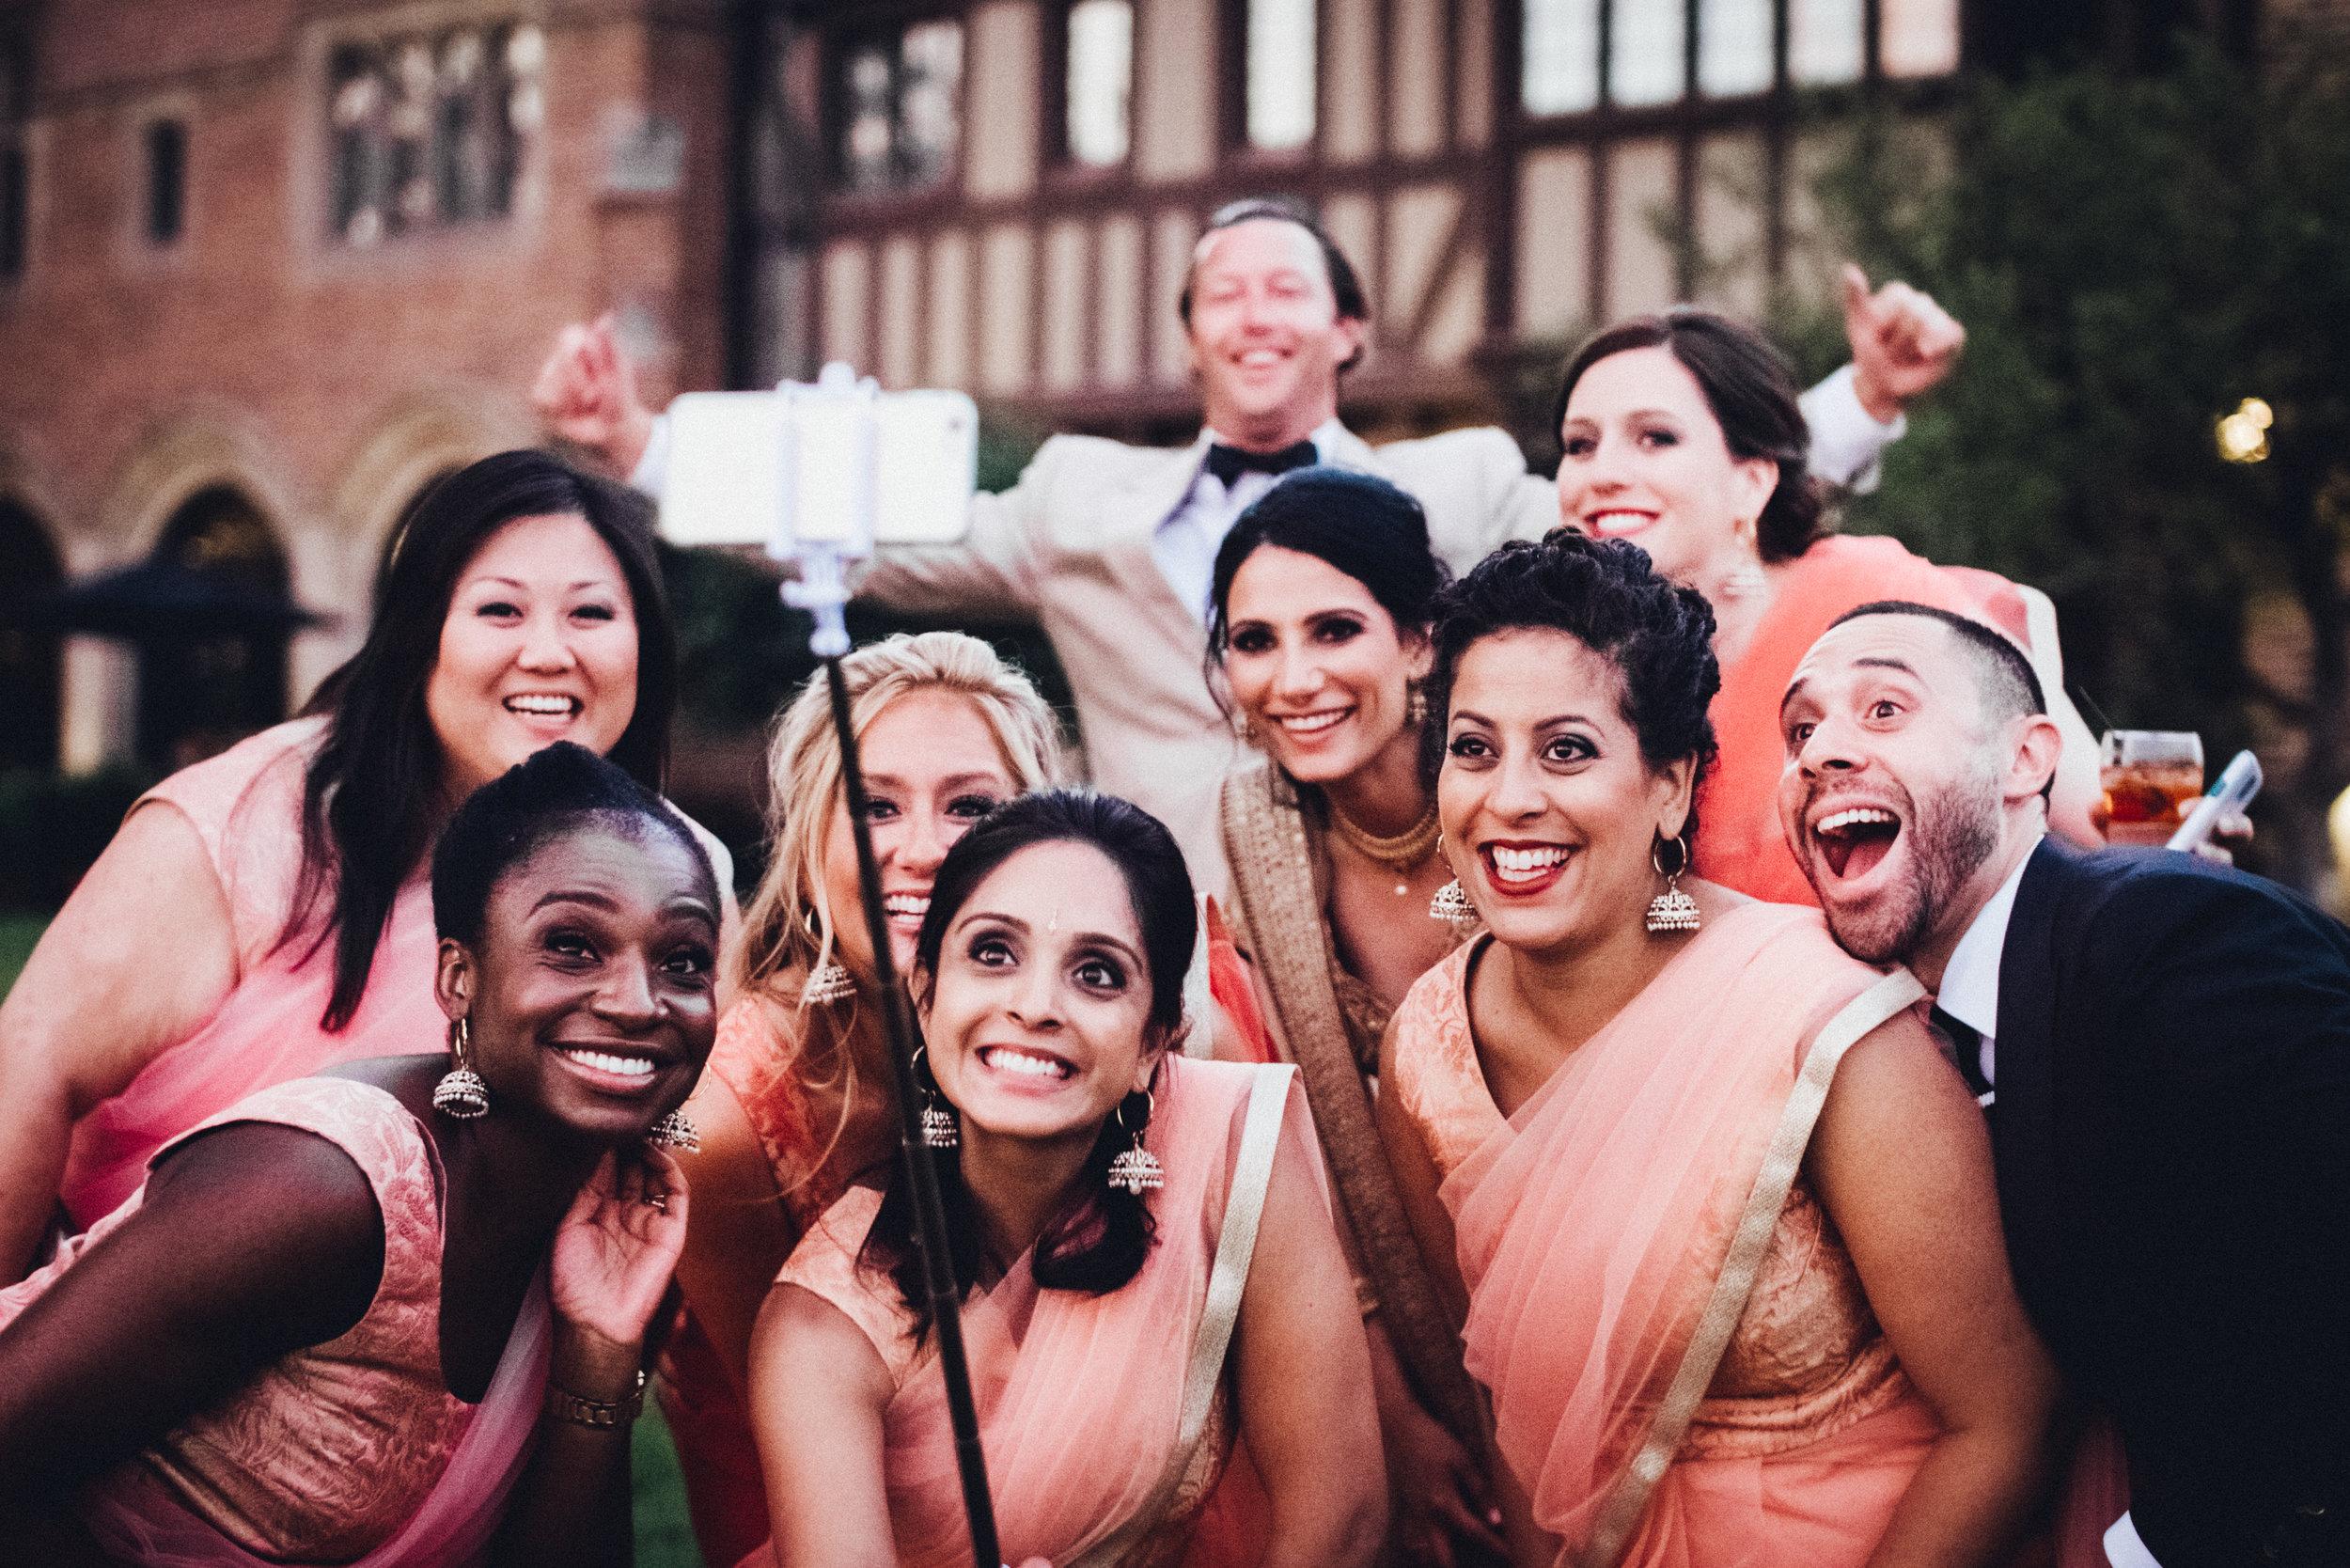 shadow-shine-pictures-avani-khristoph-becker-bhatt-wedding-videography-photography-cinematography-meadow-brook-hall-detorit-michigan